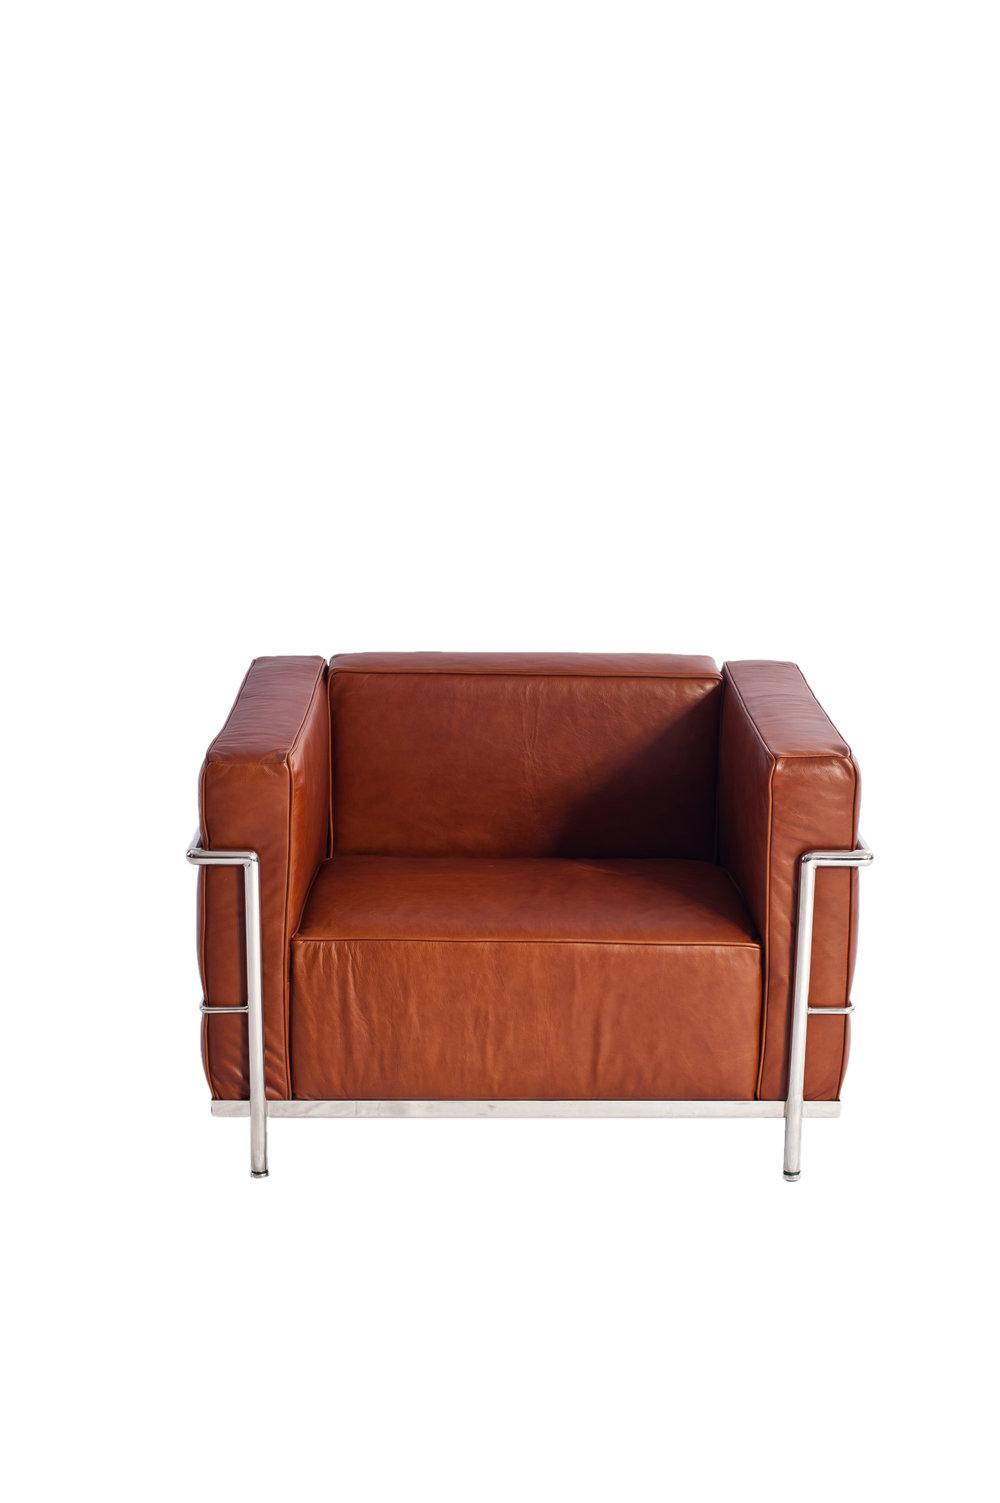 Le Corbusier Style Lc3 1 Chair Ireland Exclusive Ca Design